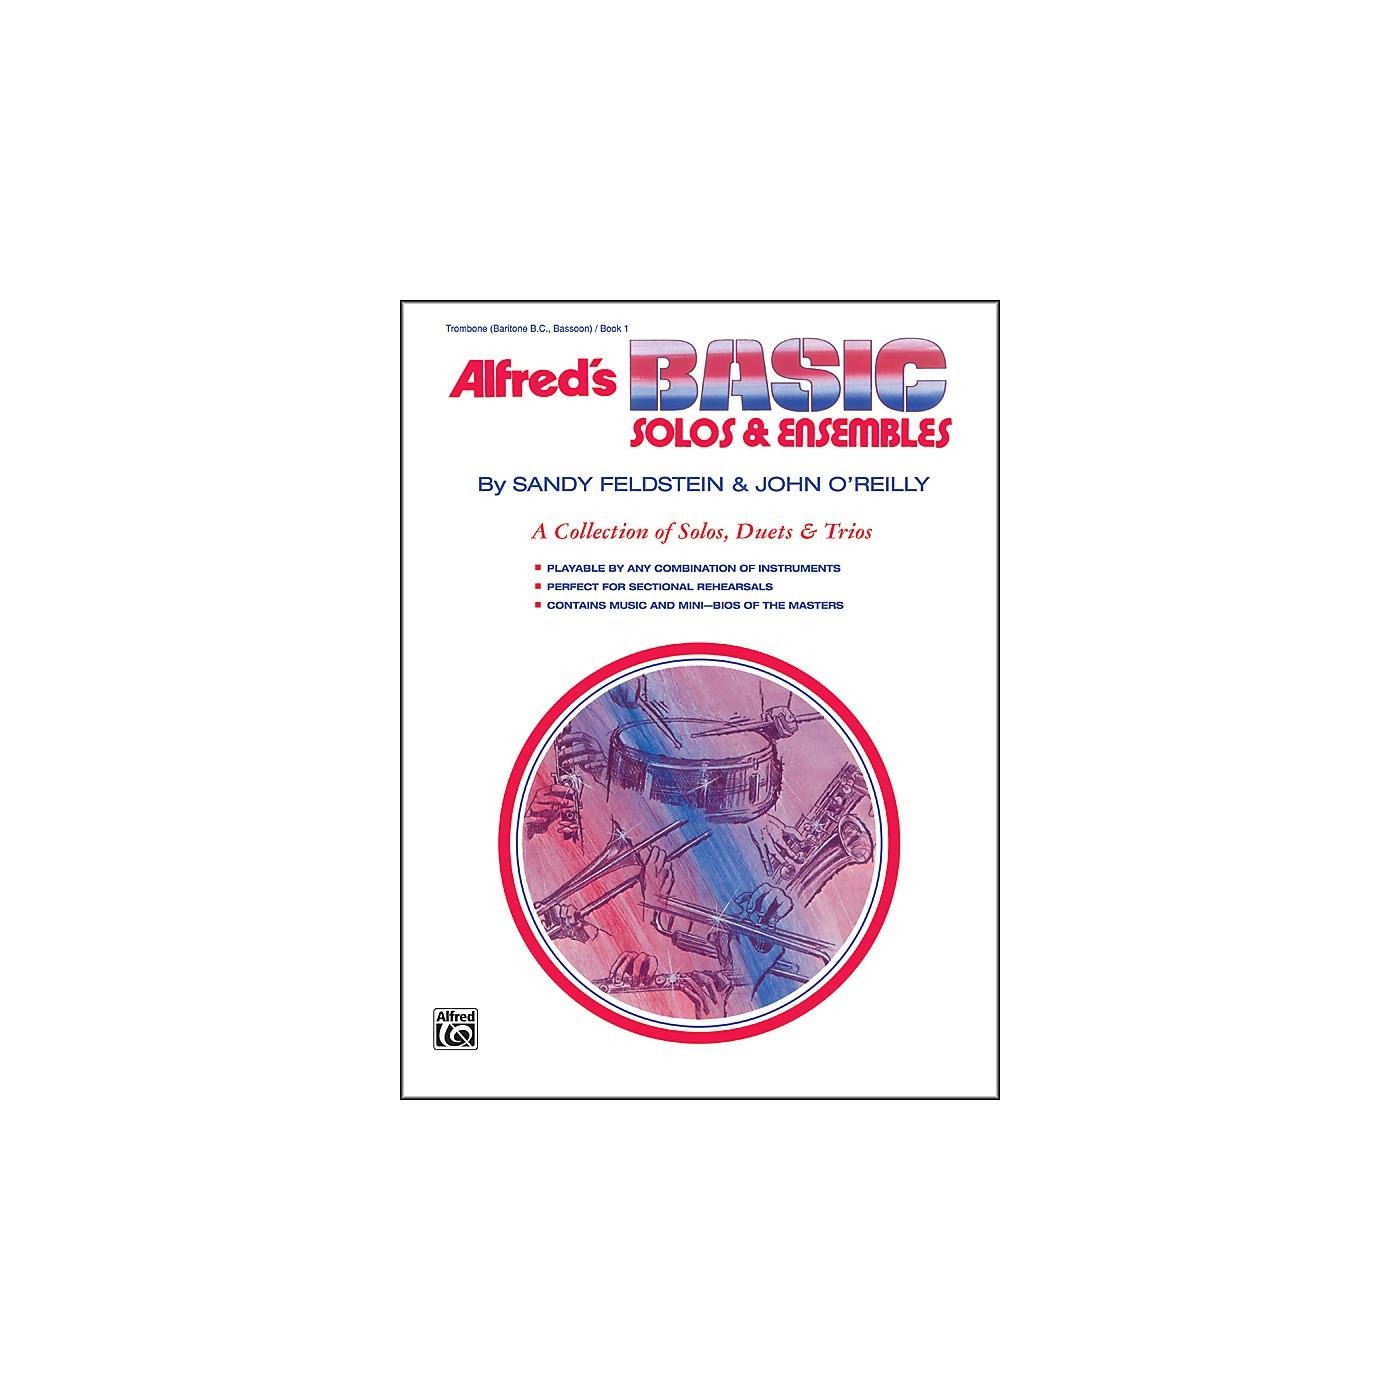 Alfred Alfred's Basic Solos and Ensembles Book 1 Trombone Baritone B.C. Bassoon thumbnail